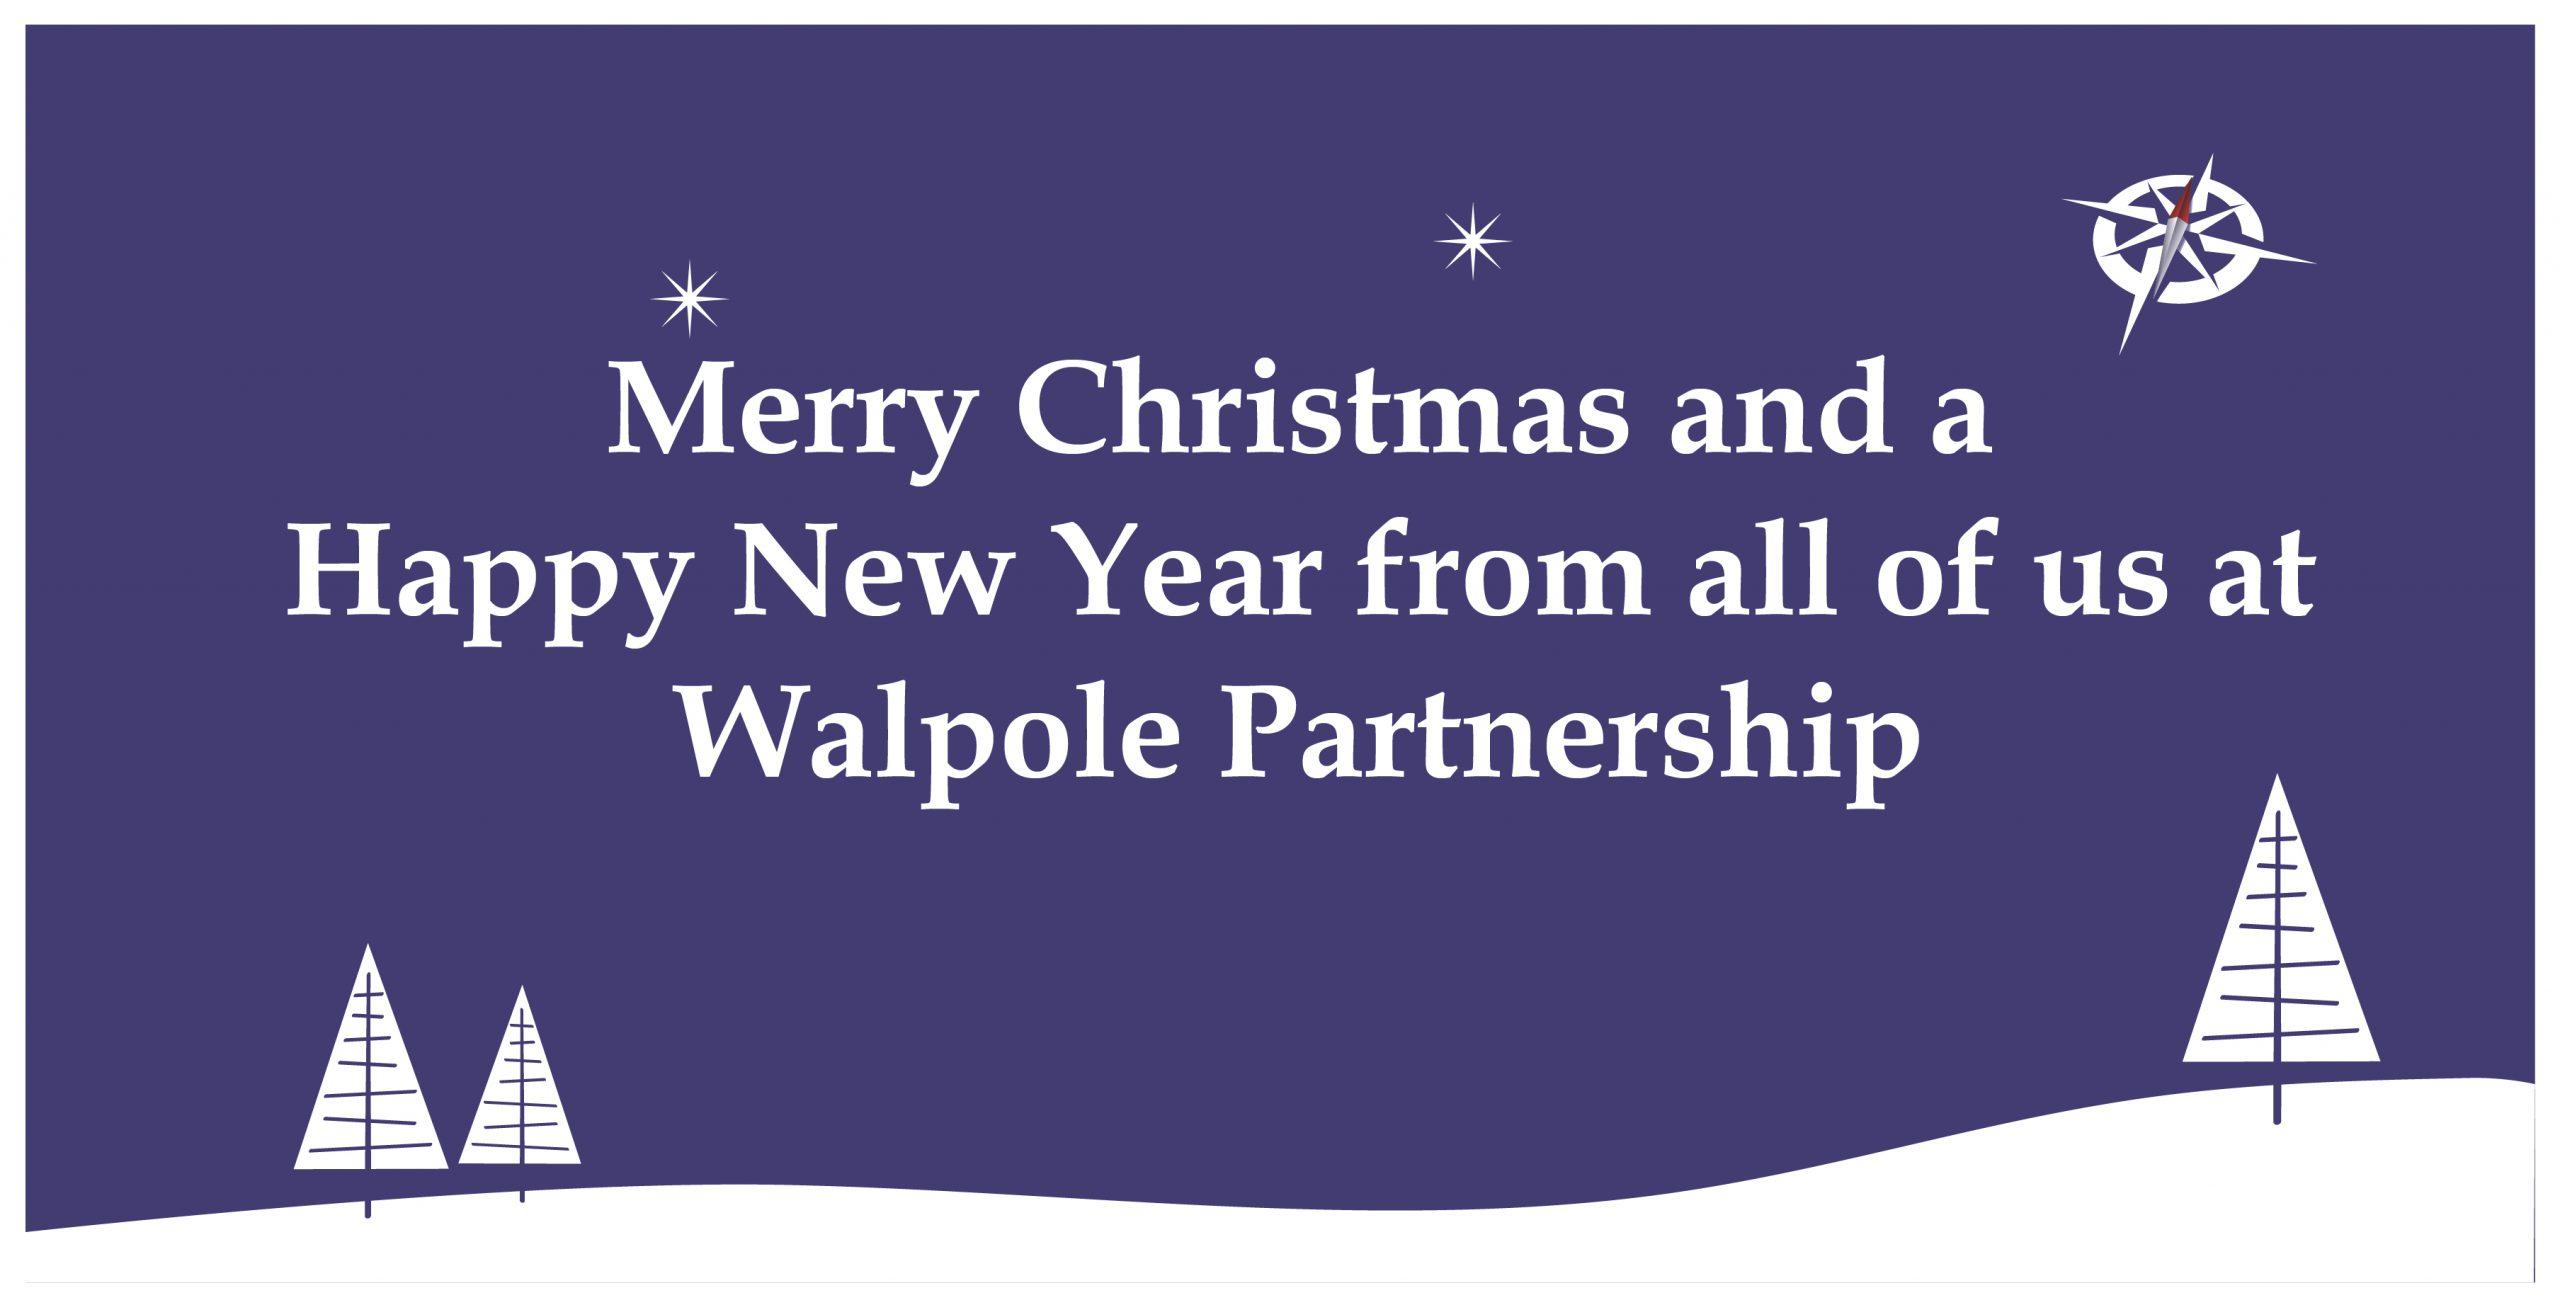 Walpole Partnership Merry Christmas 2019